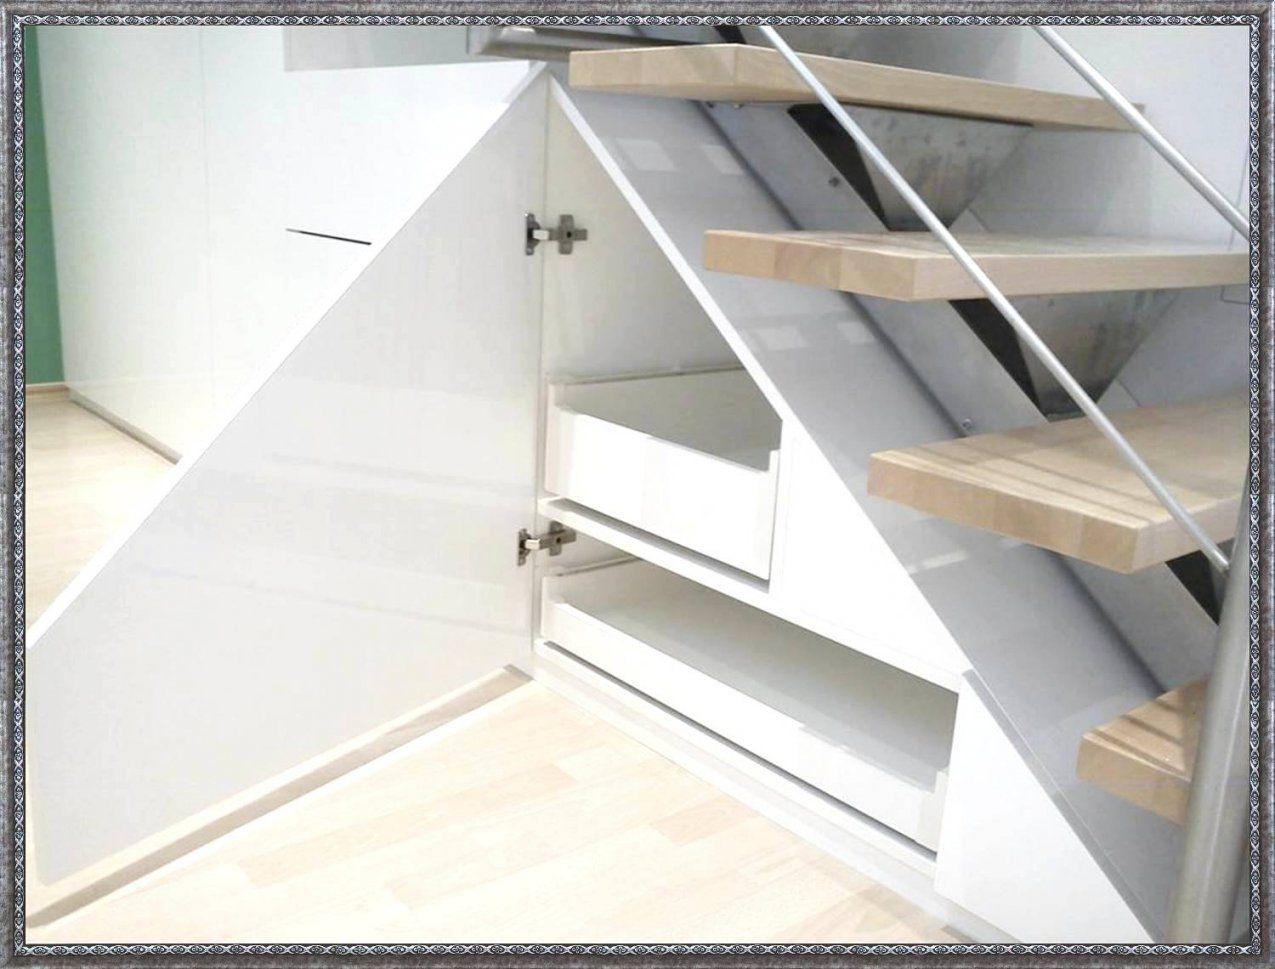 Attraktiv Mobel Möbel Und Holztreppe Selber Bauen  Pantonhillfc von Holztreppe Selber Bauen Anleitung Bild